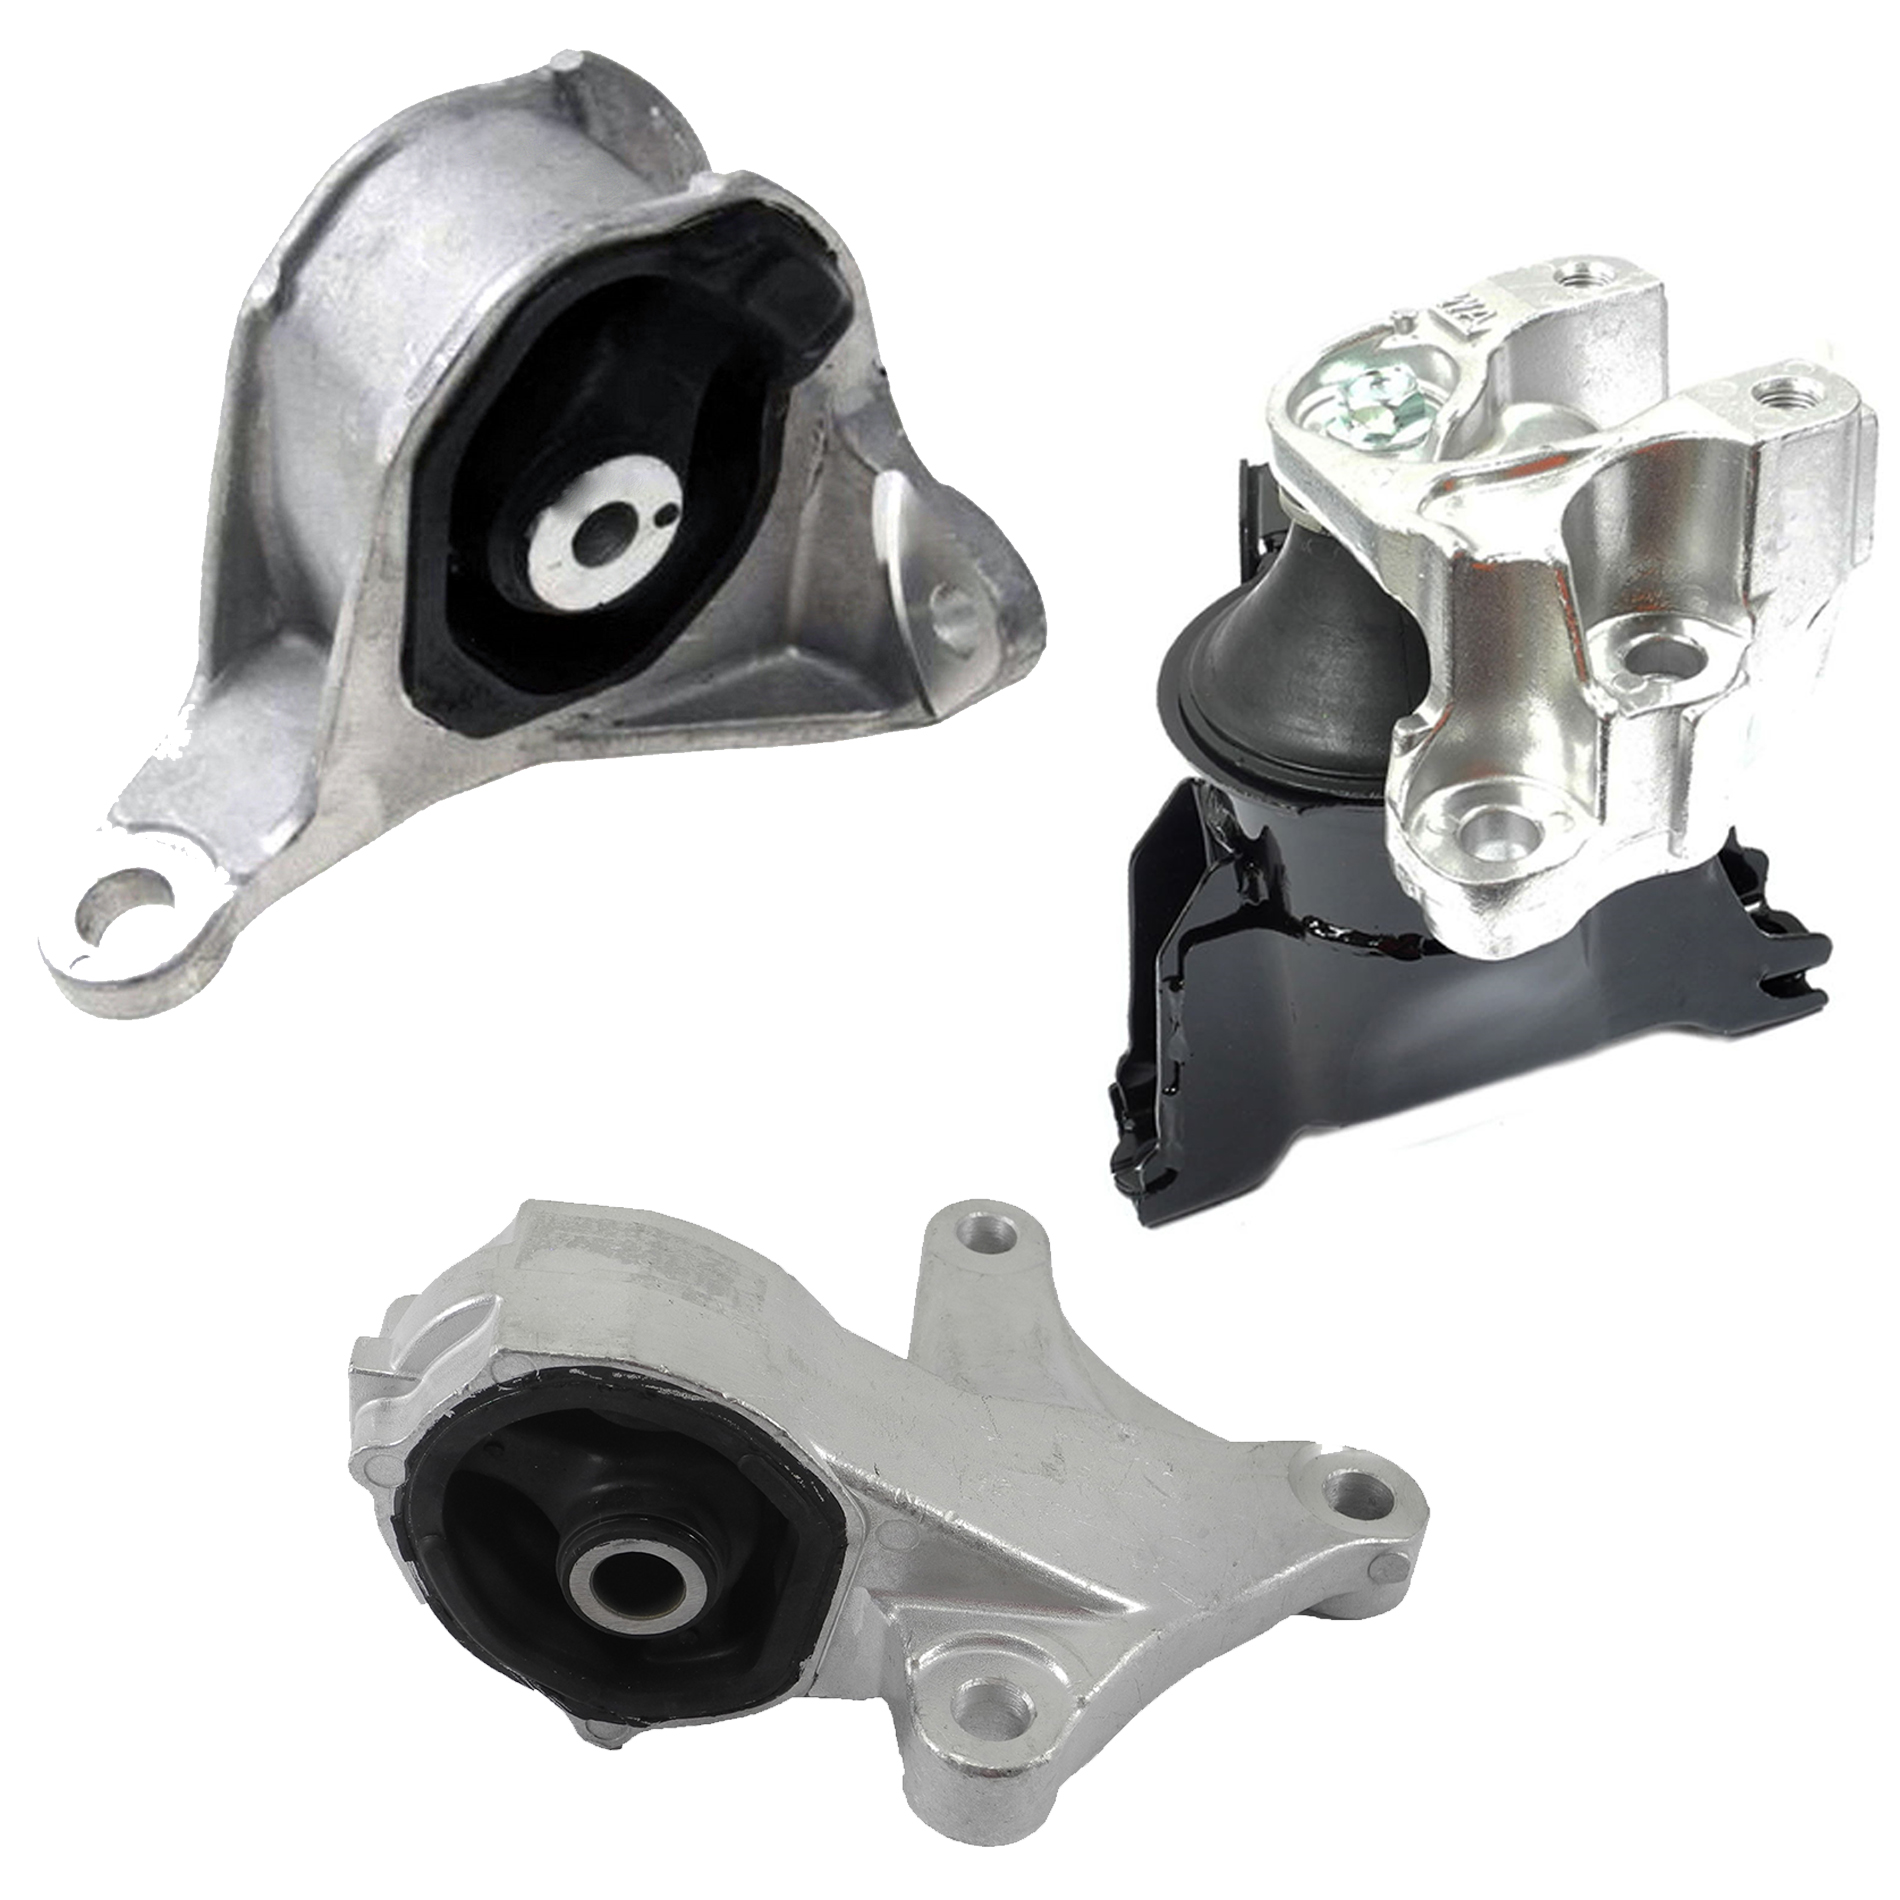 A65055 Front Engine Motor Mount Fits 12-14 HONDA CRV 2.4L